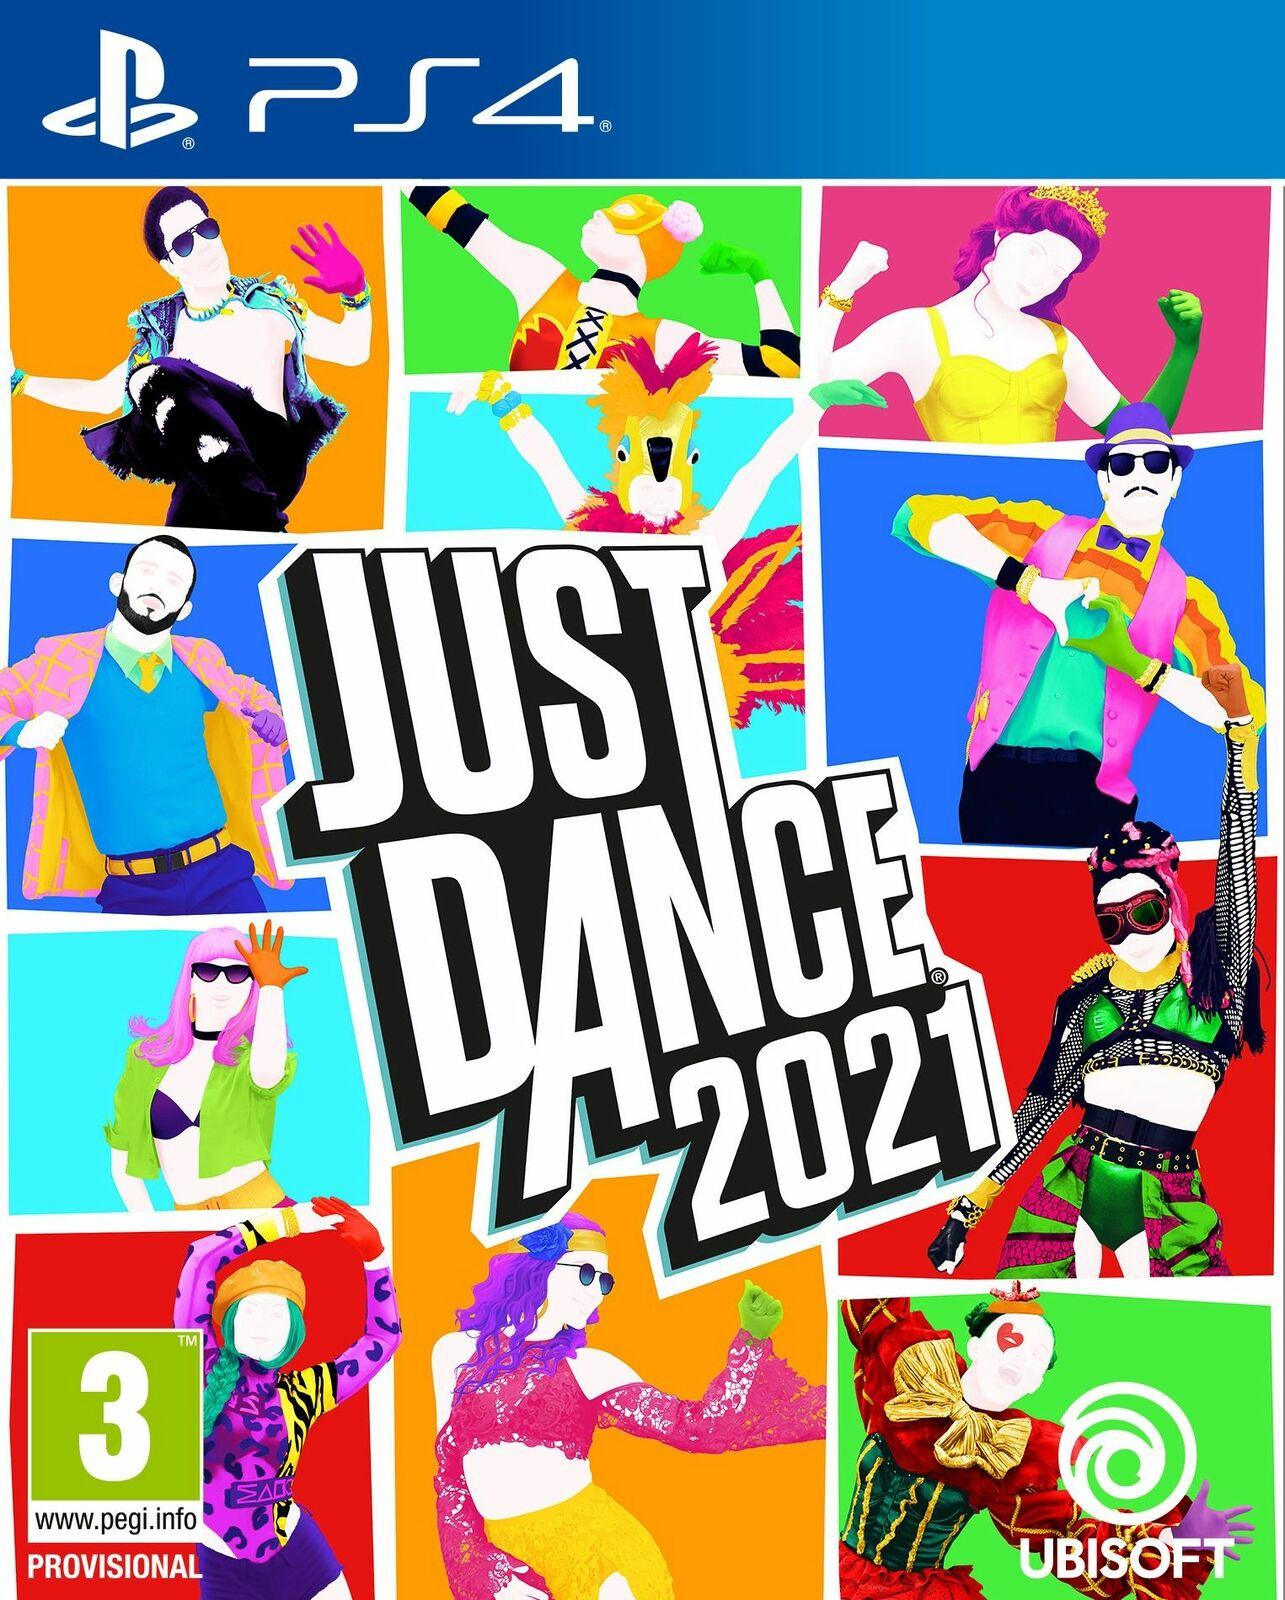 Just Dance 2021 PS4 / Xbox One - £23.99 @ Boss Deals eBay